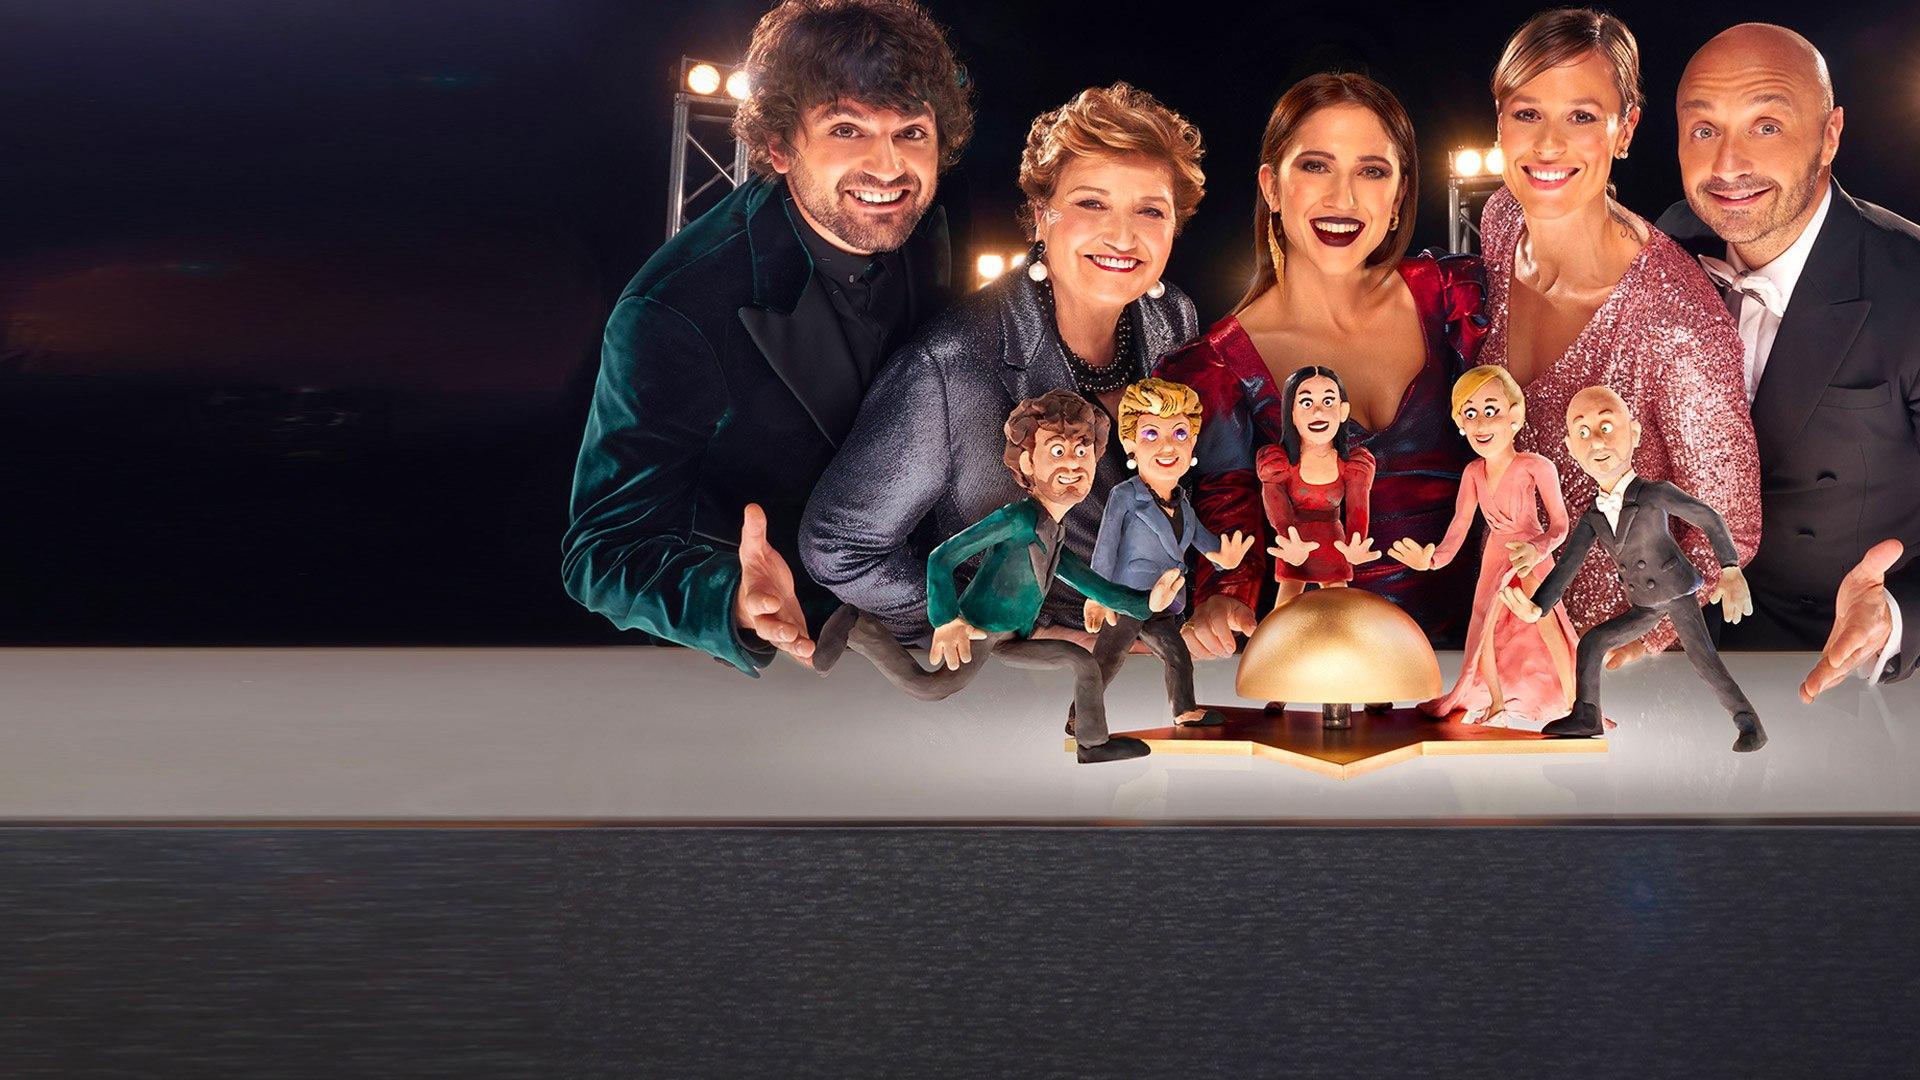 Sky Uno Italia's Got Talent